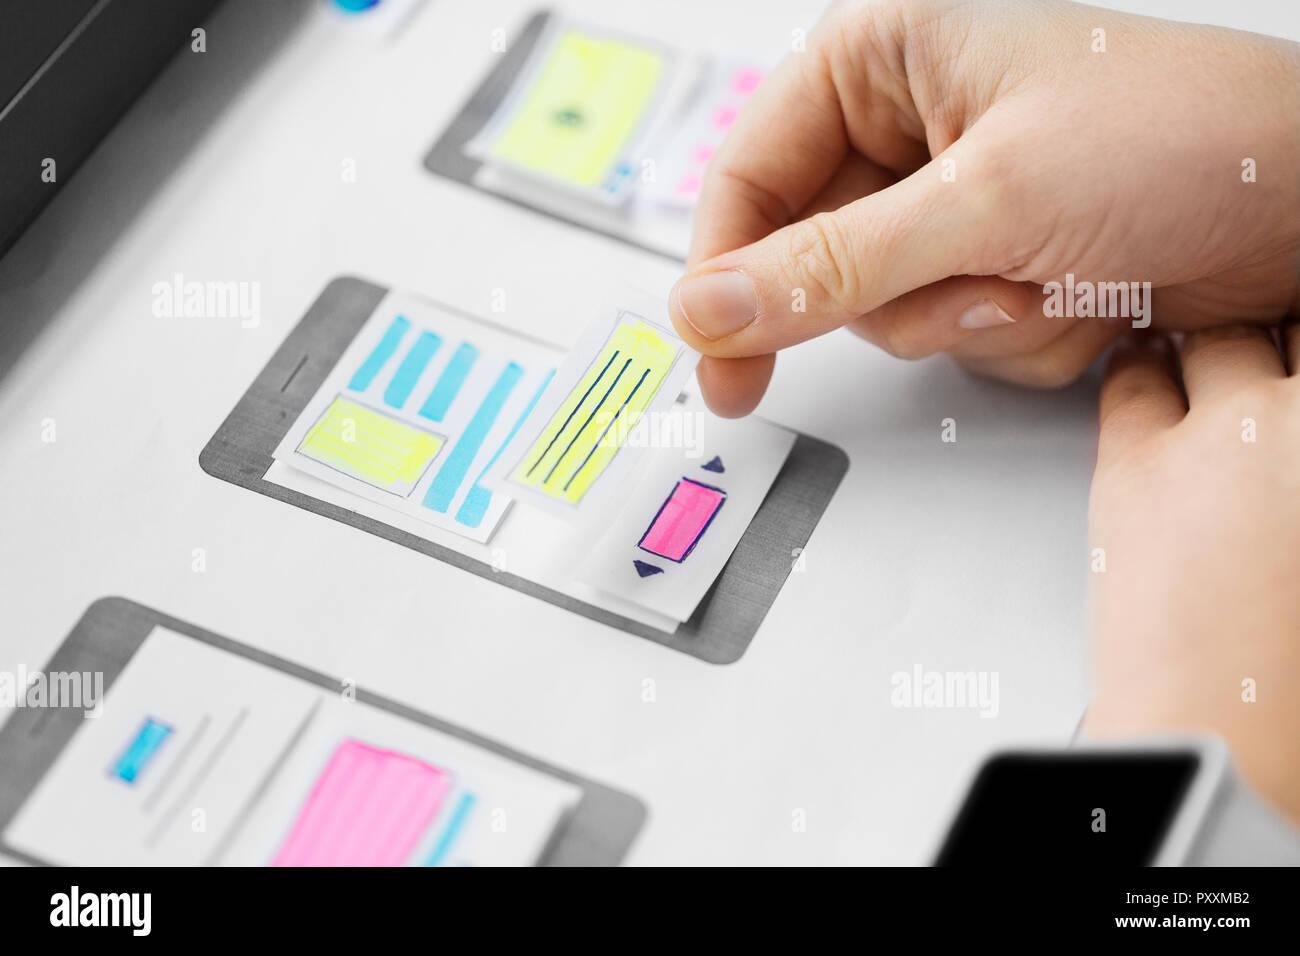 web designer working on user interface wireframe - Stock Image